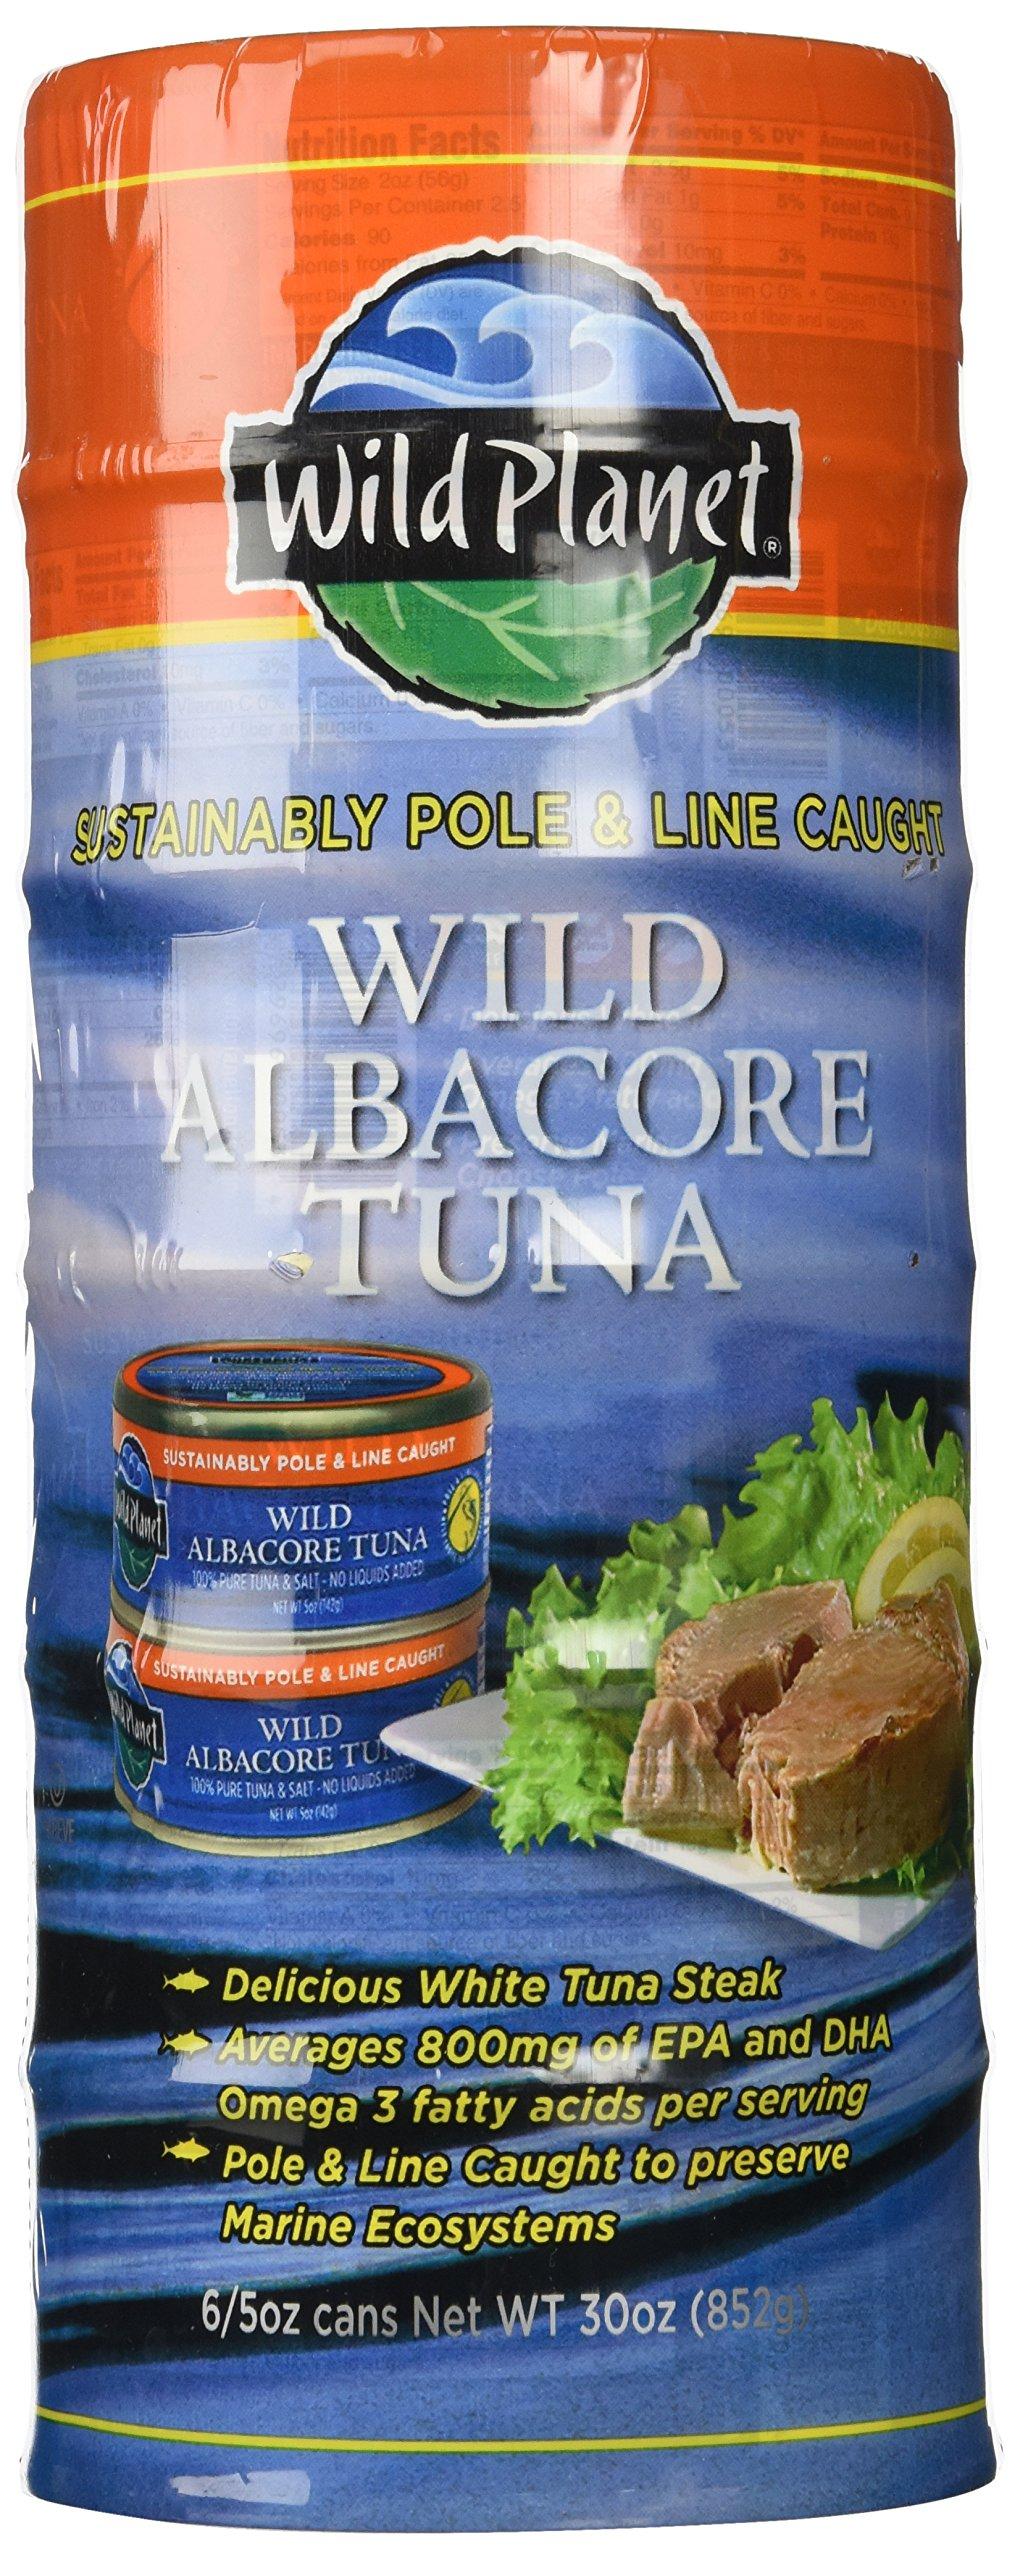 Wild Planet Wild Albacore Tuna Six 5oz. Cans